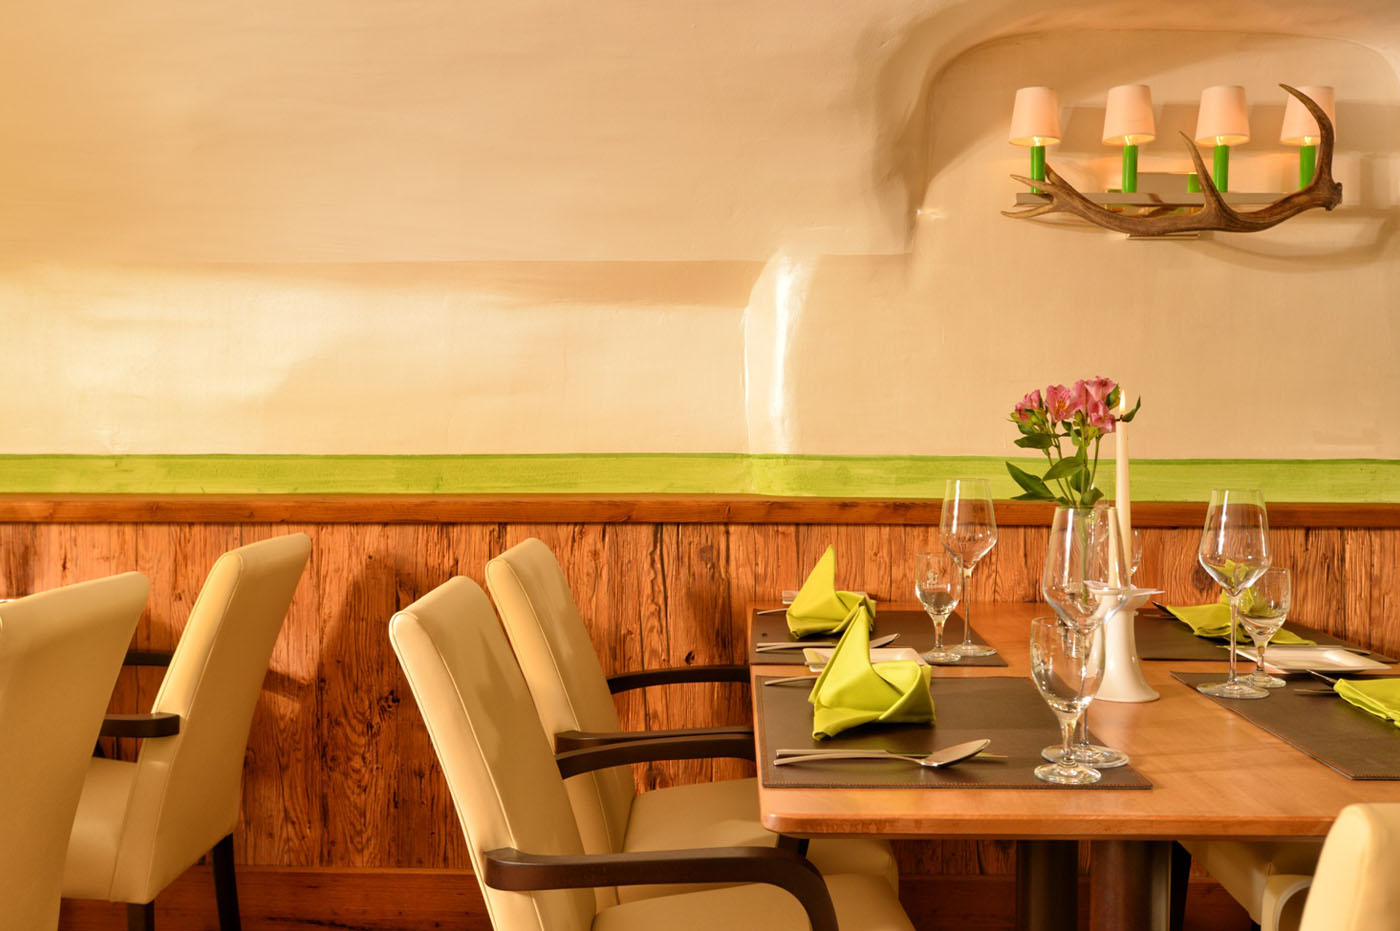 posthotel schladming stainer sun wood. Black Bedroom Furniture Sets. Home Design Ideas